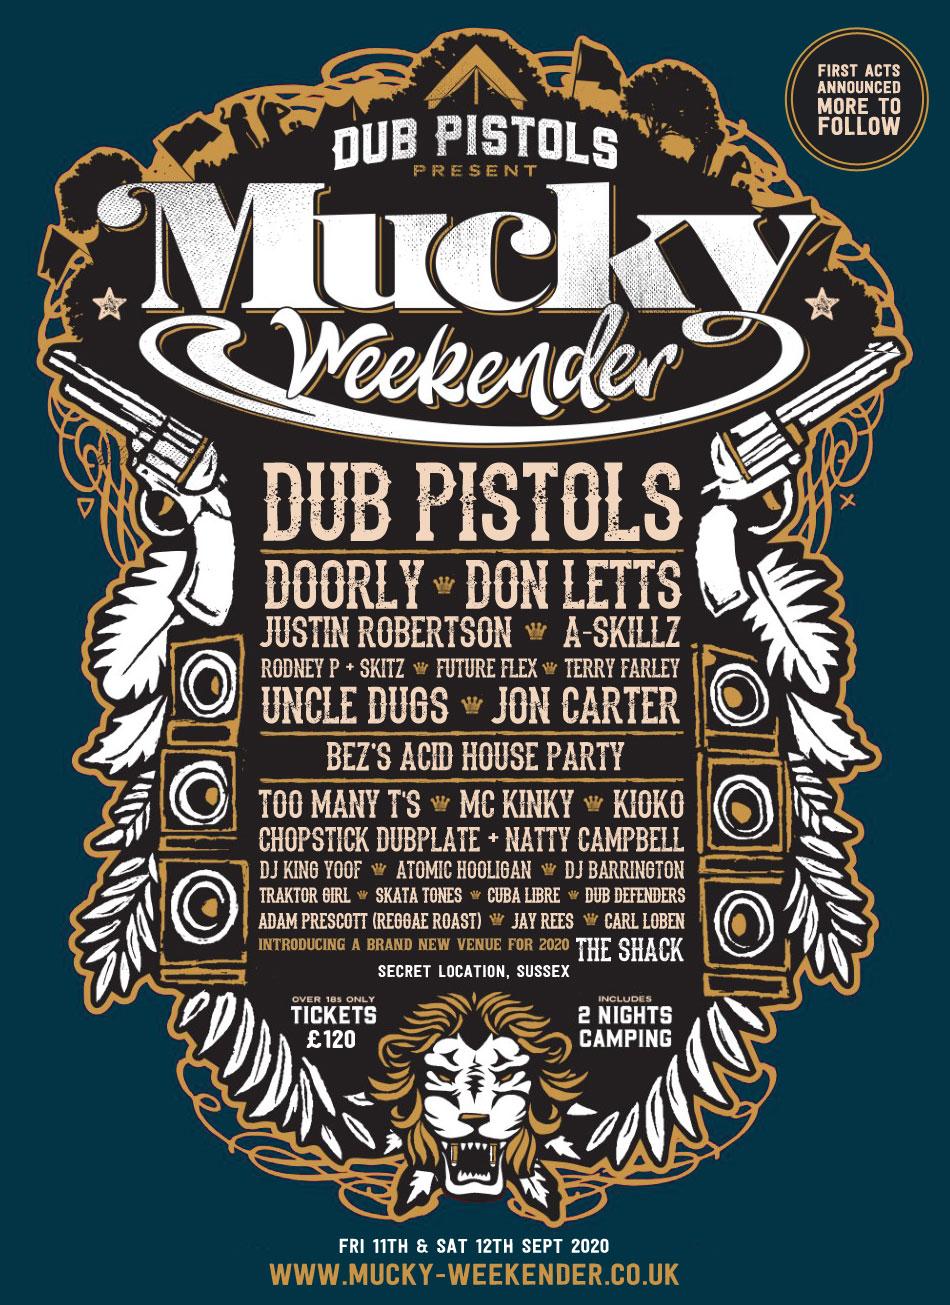 Mucky Weekender 2020 Line up flyer